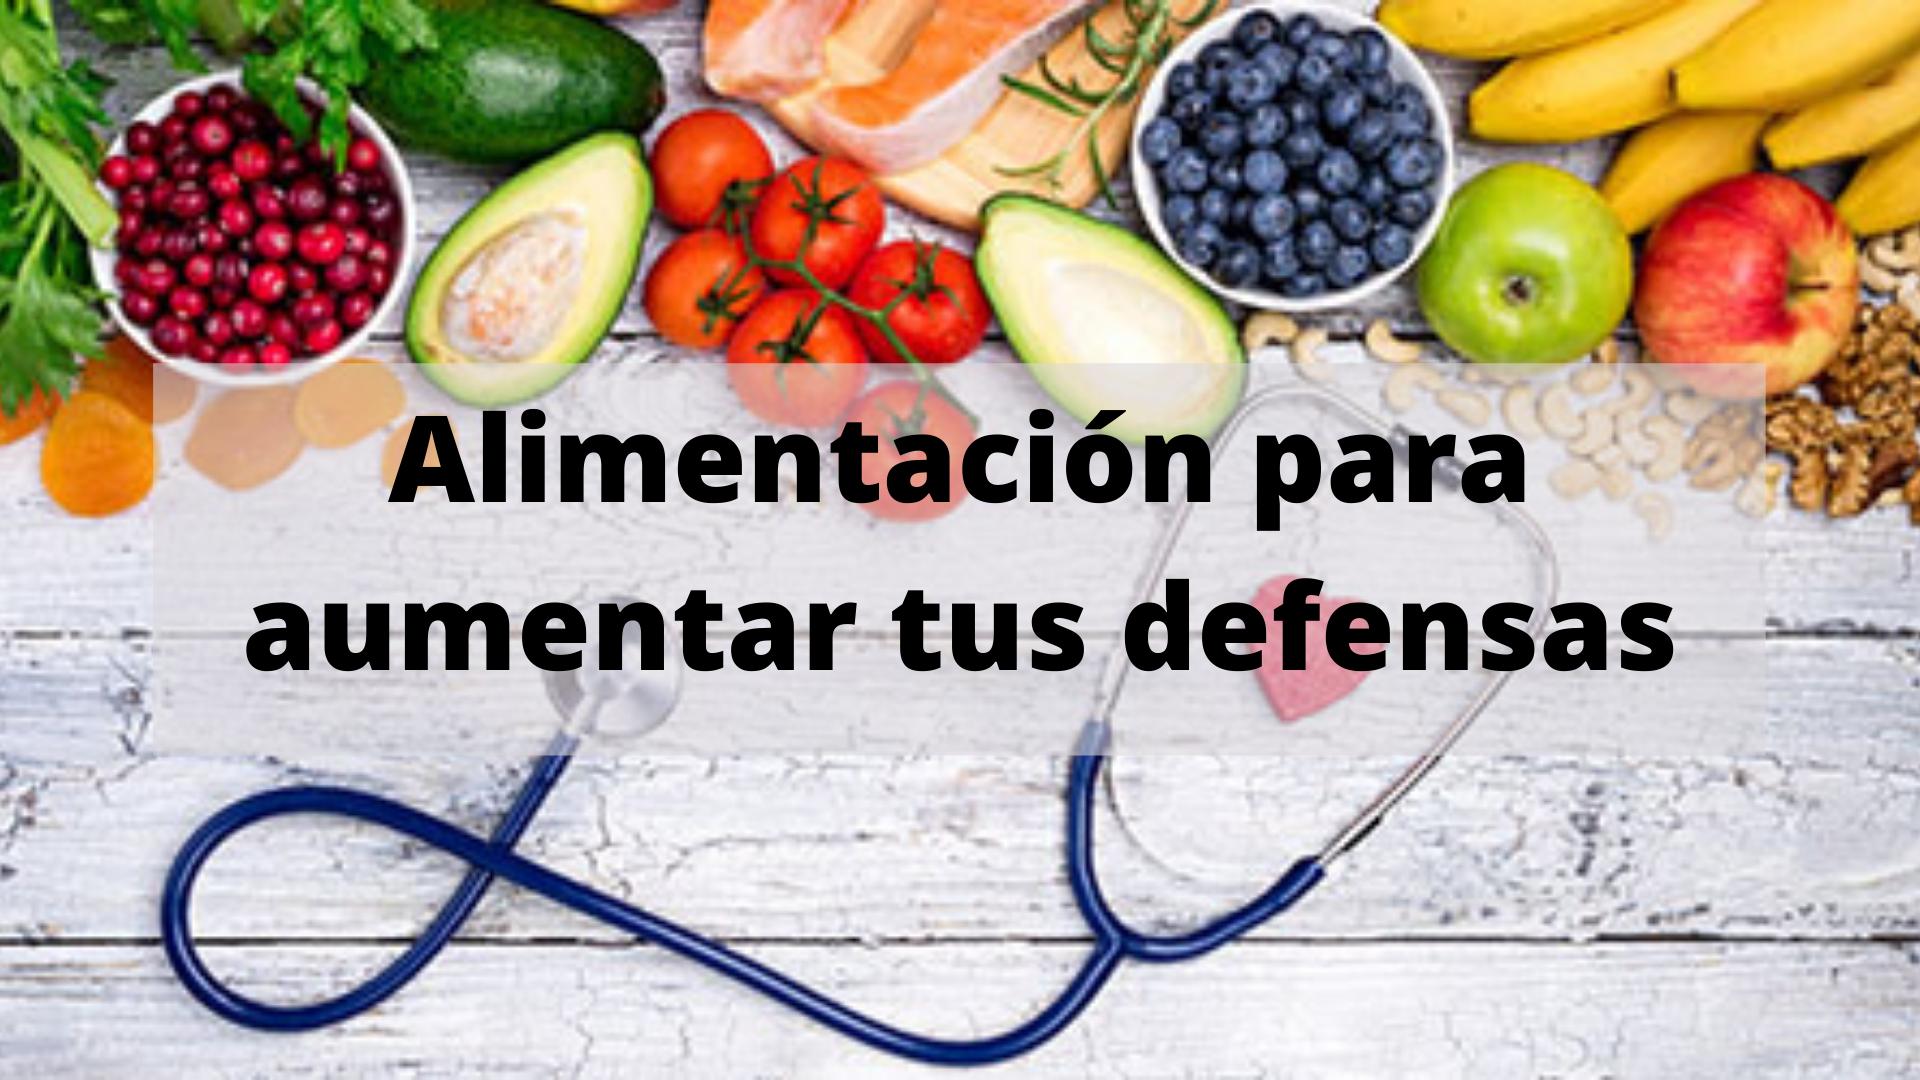 soma salud murcia nutricion alimentacion sana sano vida defensas bienestar